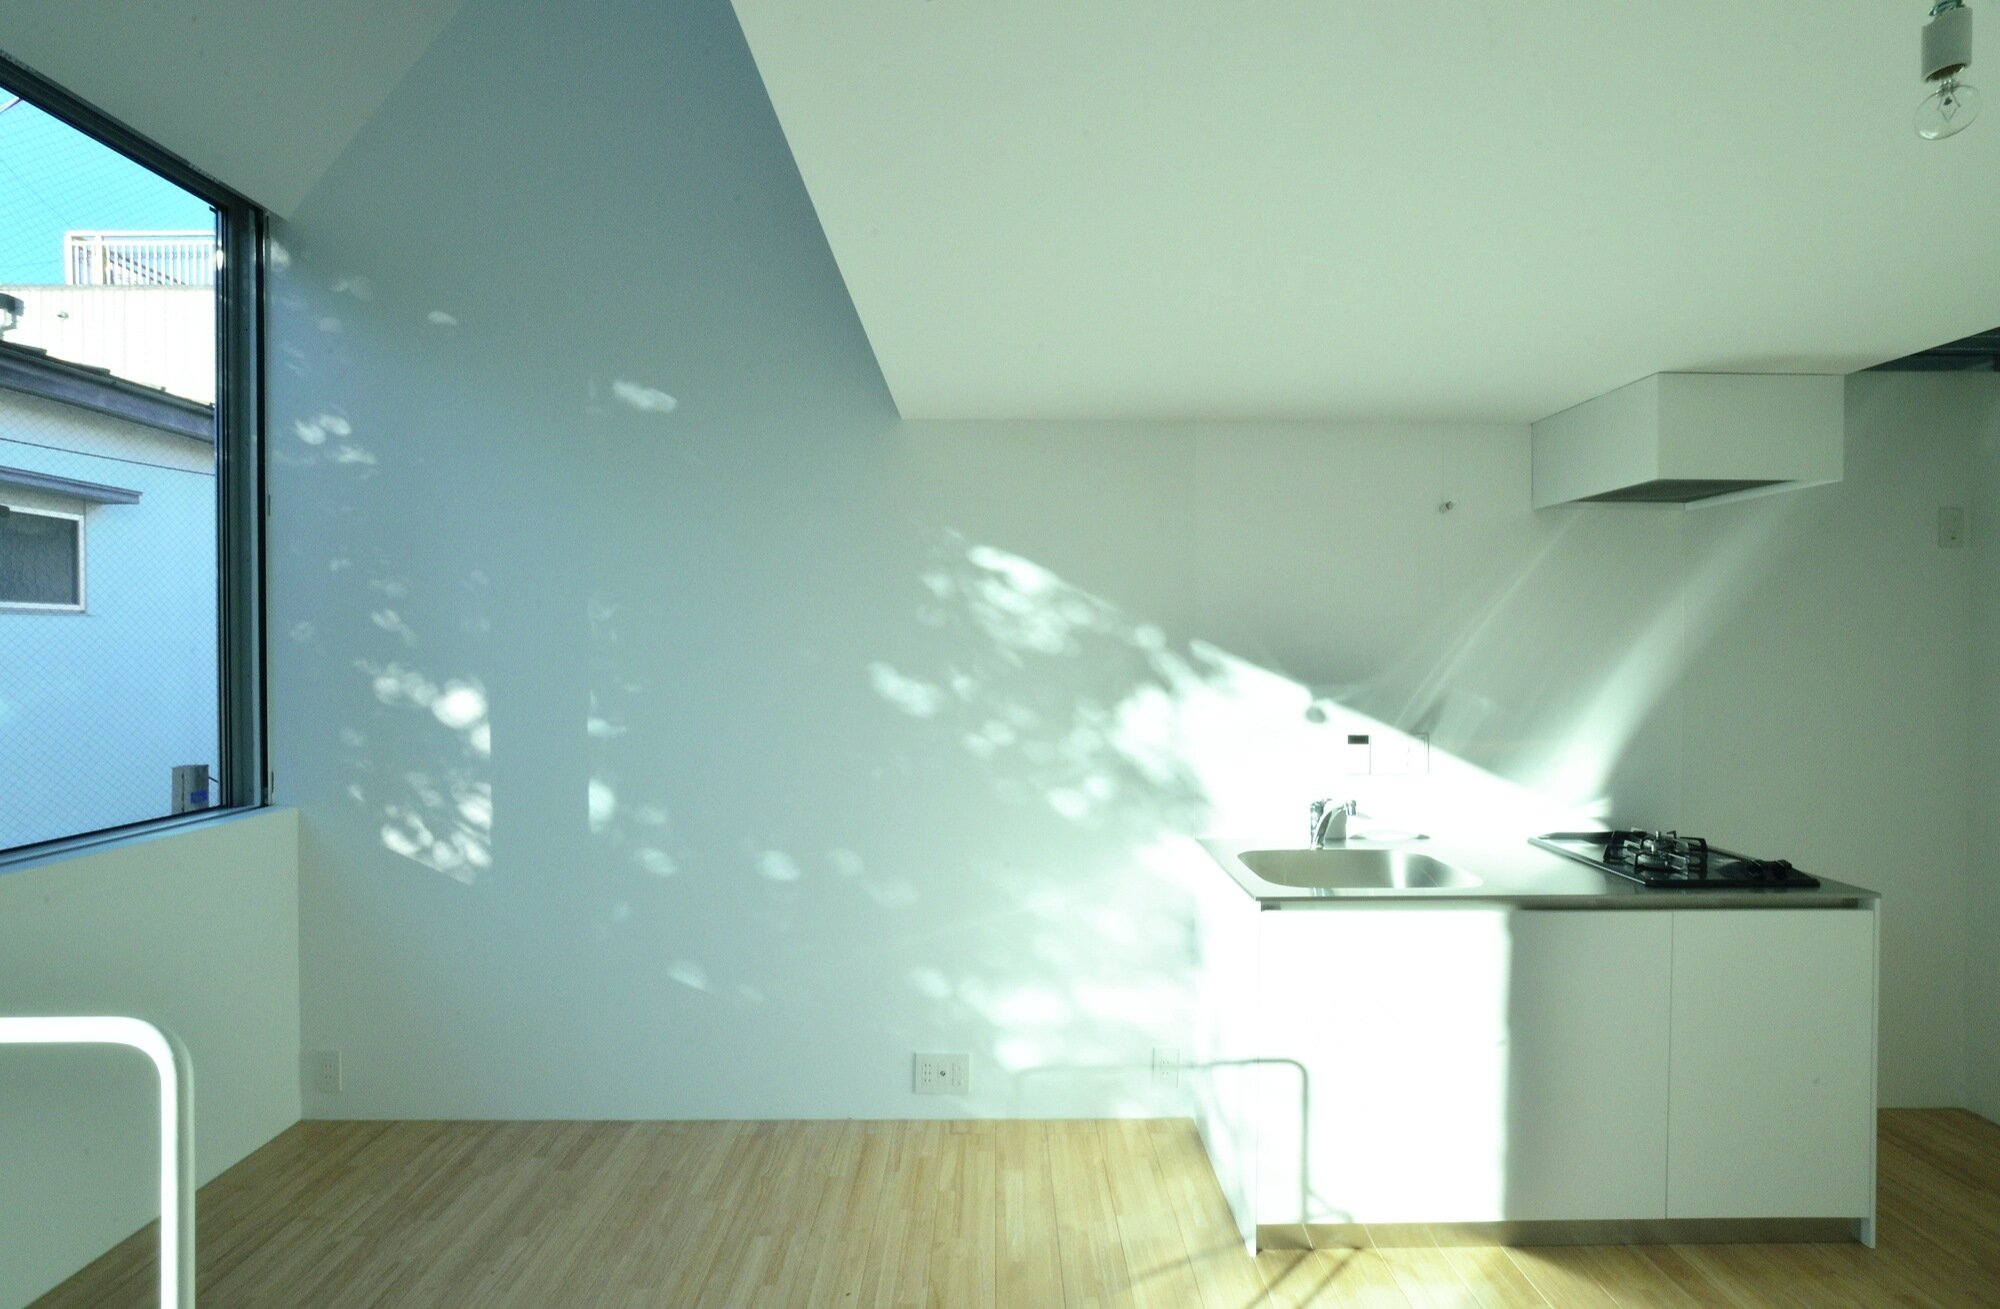 Townhouse in Takaban - Niji Architects - Tokyo - Kitchen - Humble Homes